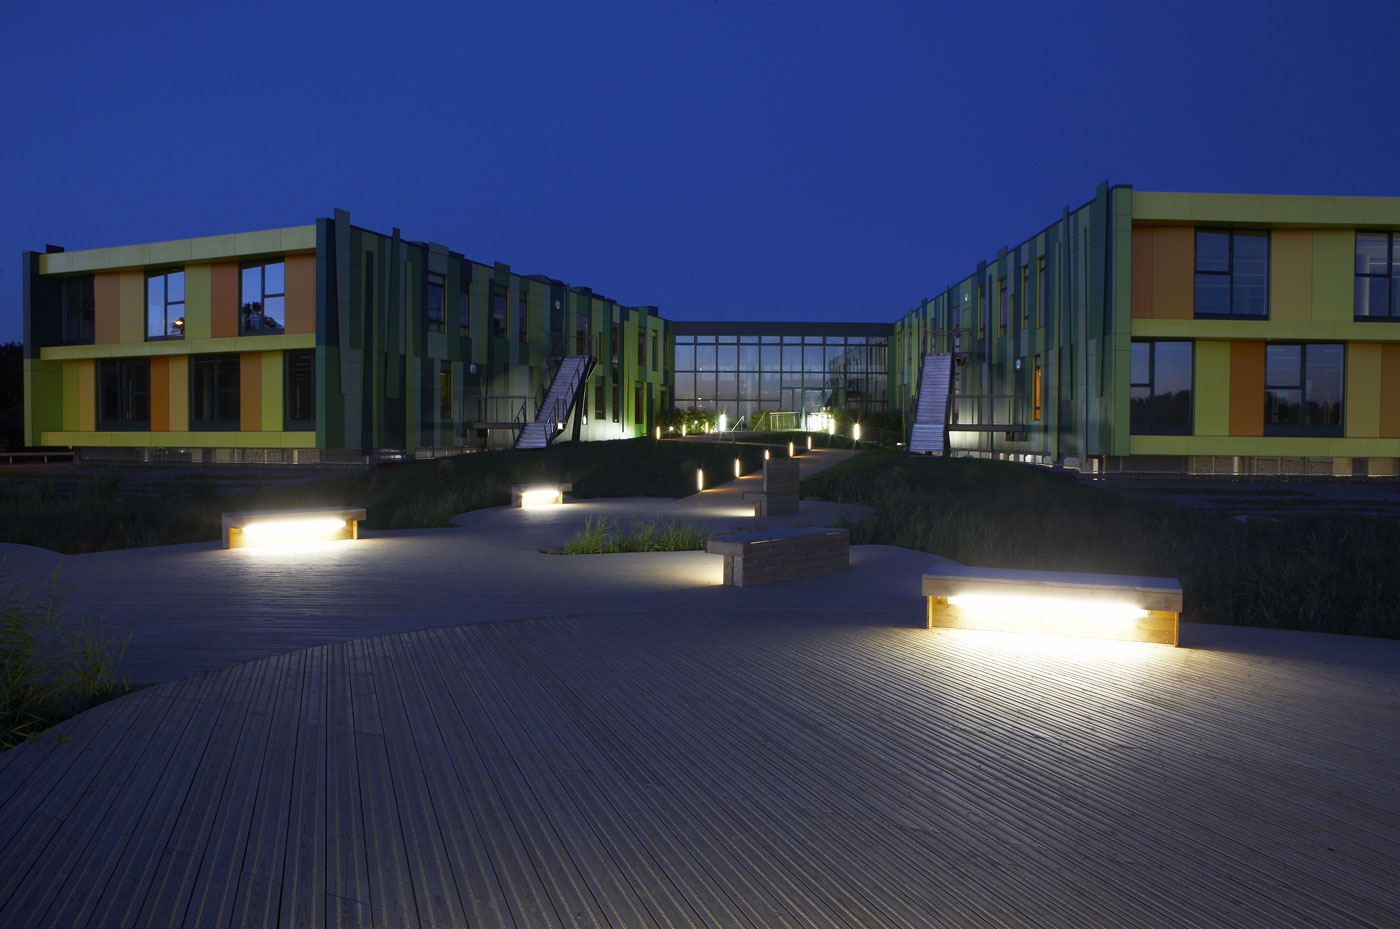 No. 1 Nottingham Science Park outlook | Architectural Photography London